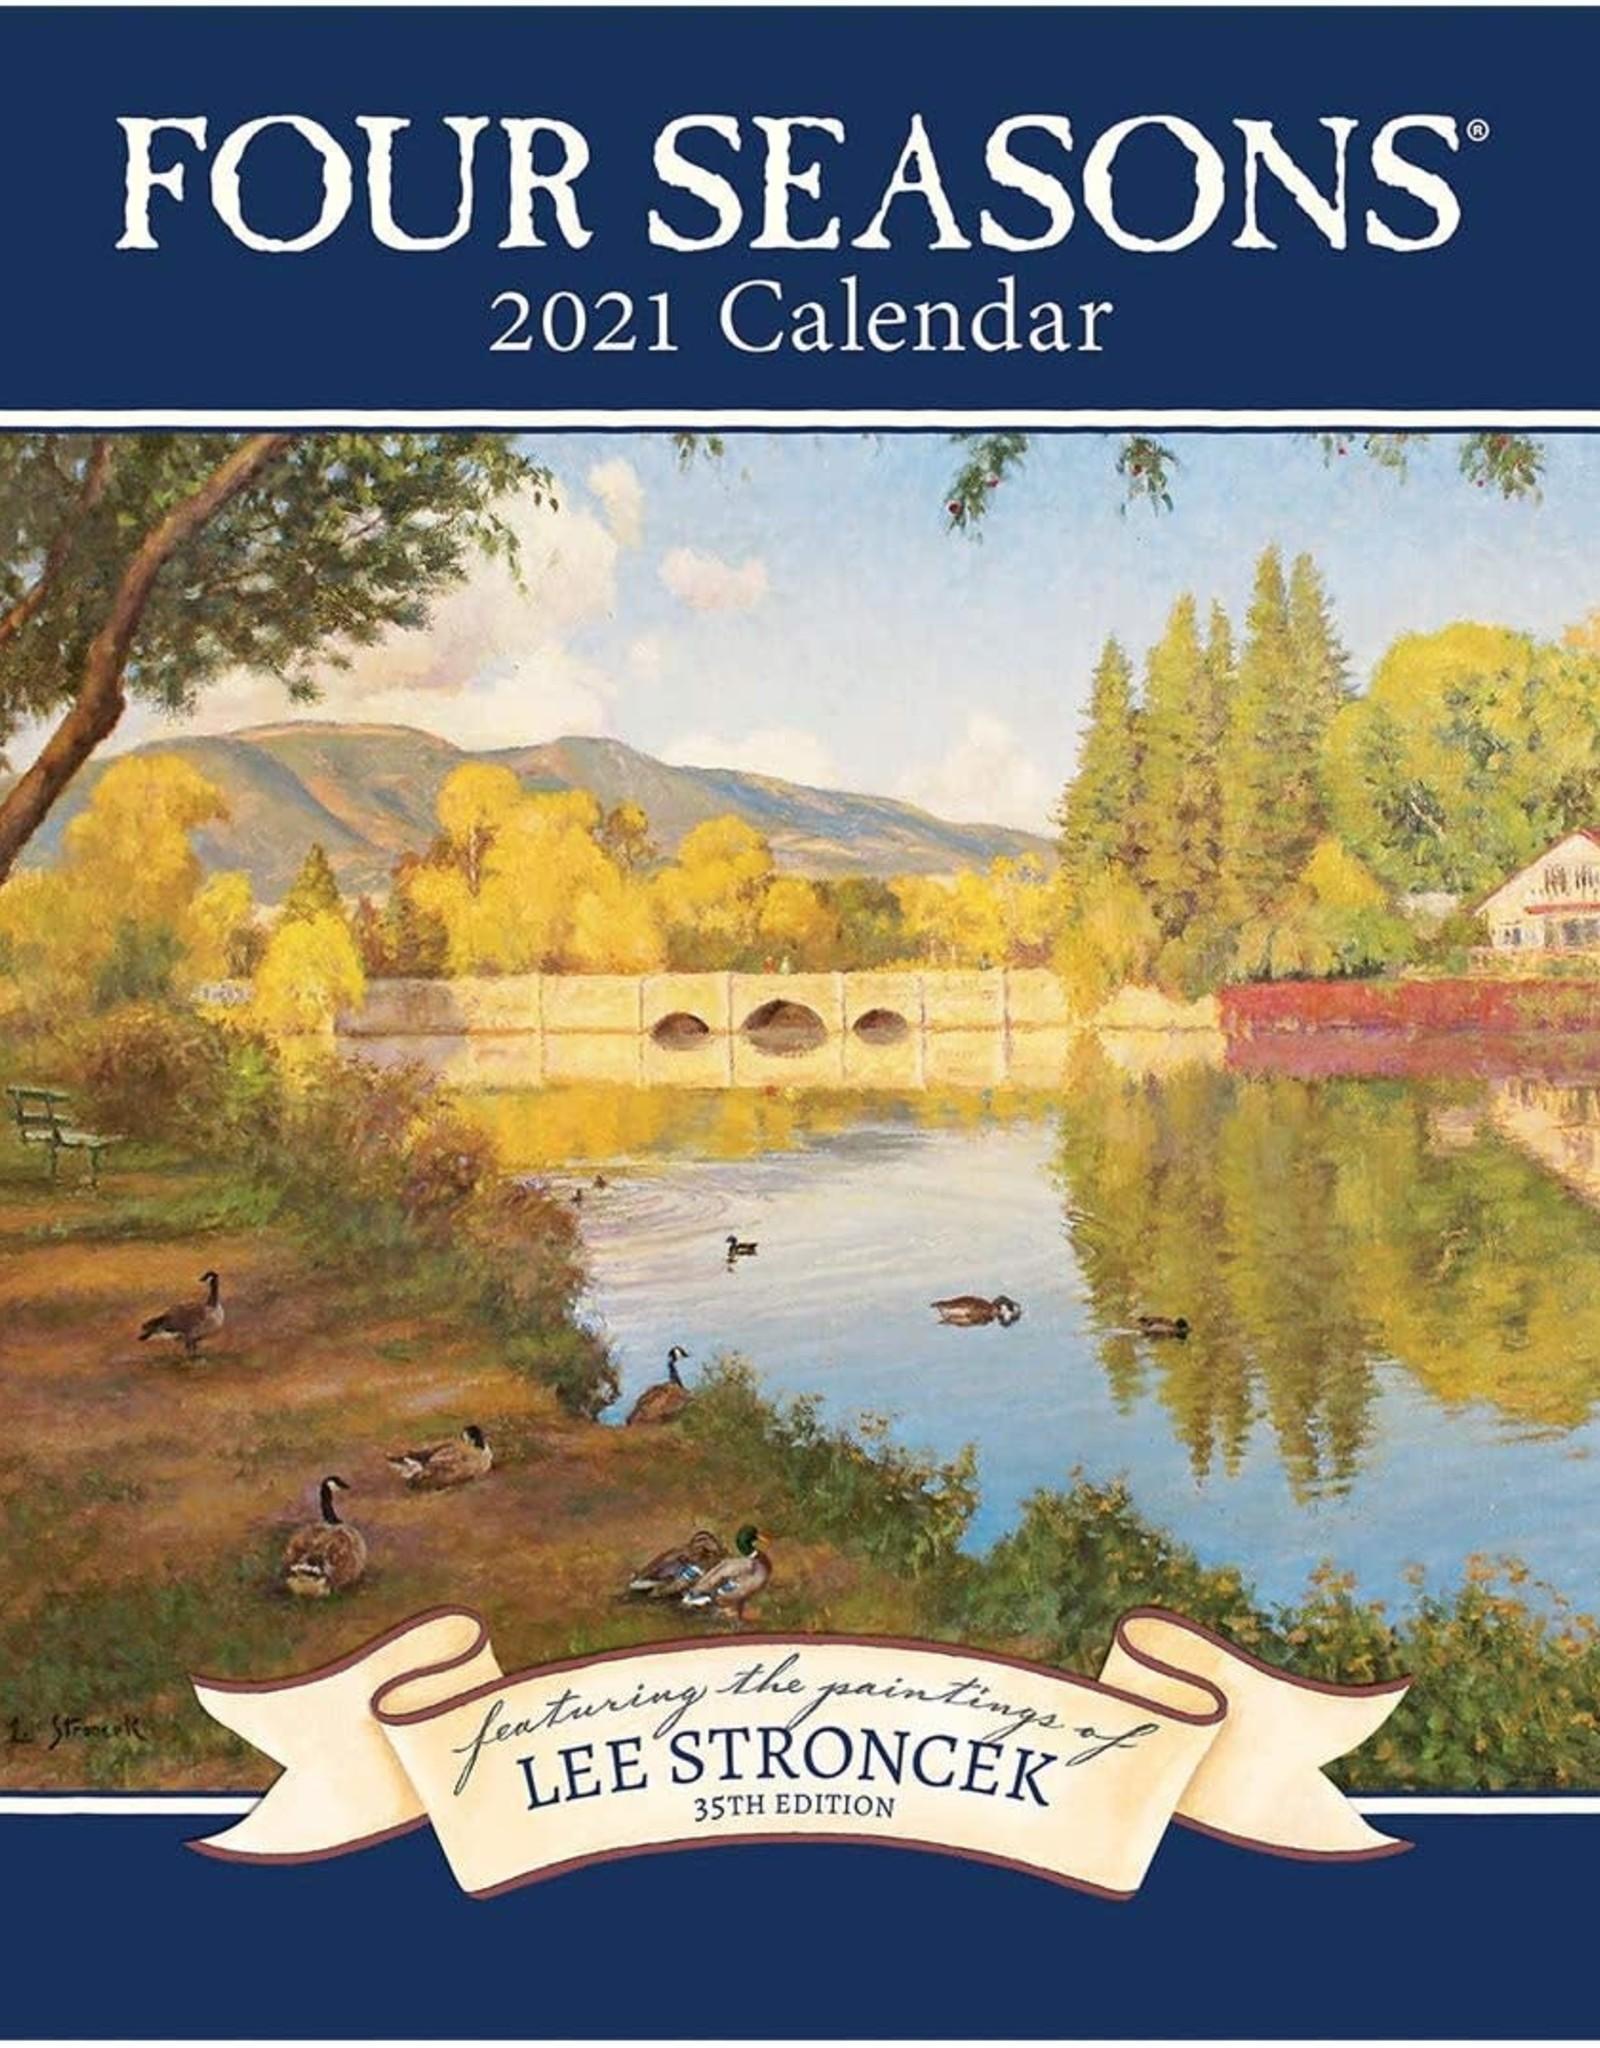 Calendrier 2021 Four seasons